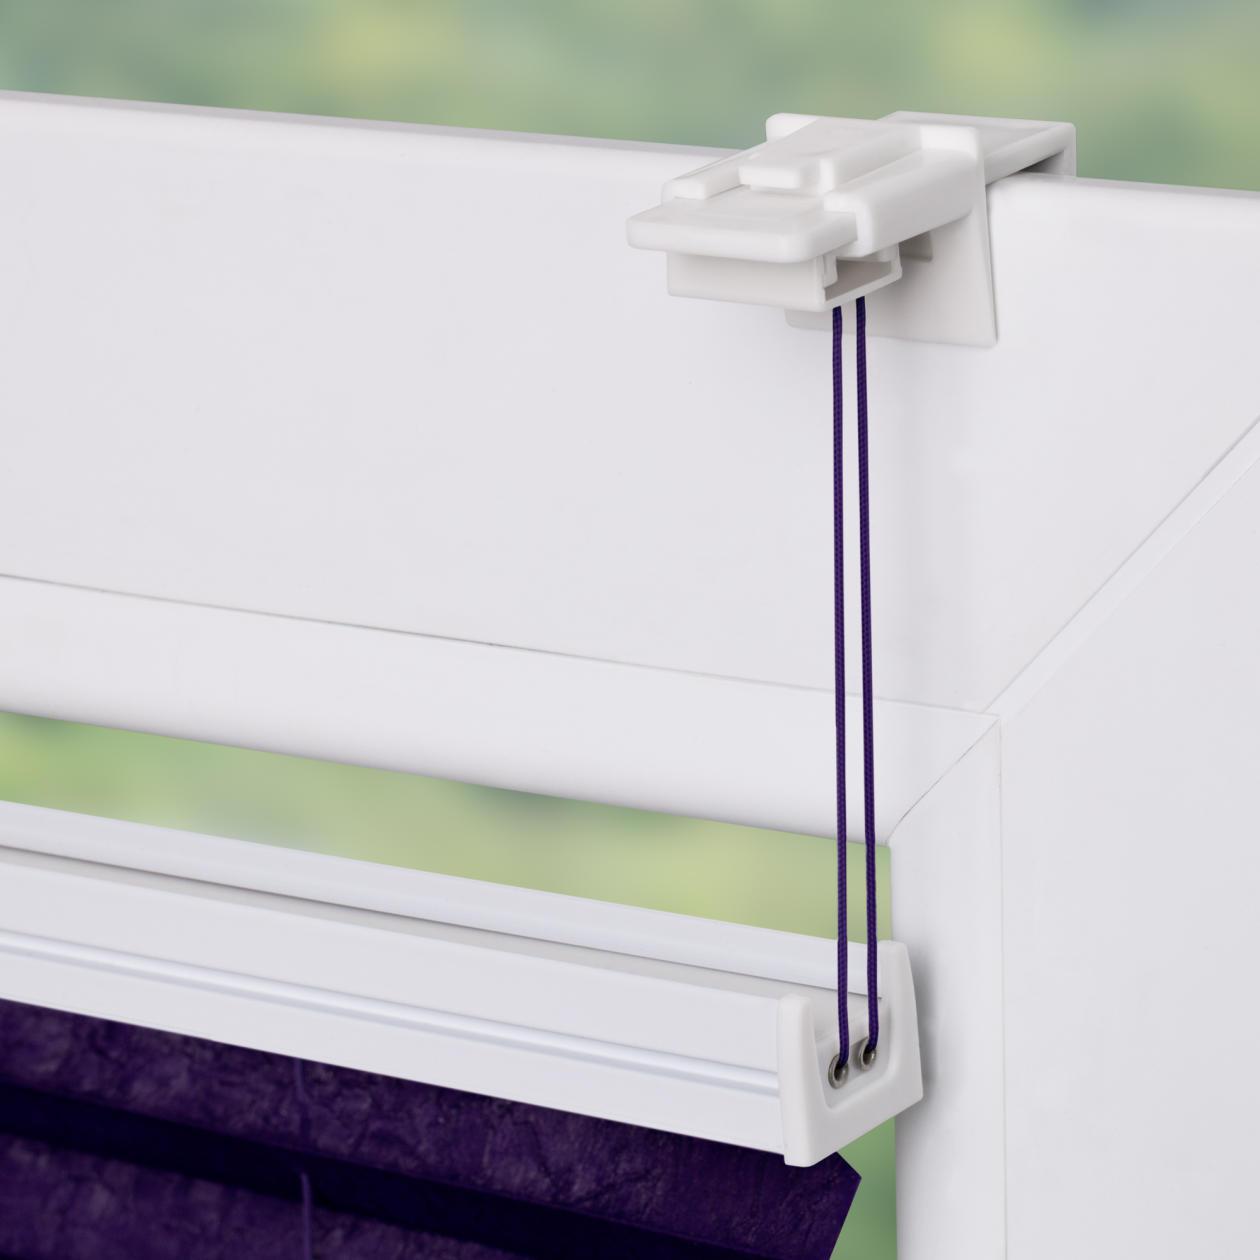 plissee klemmfix top ohne bohren verspannt lichblick shop. Black Bedroom Furniture Sets. Home Design Ideas